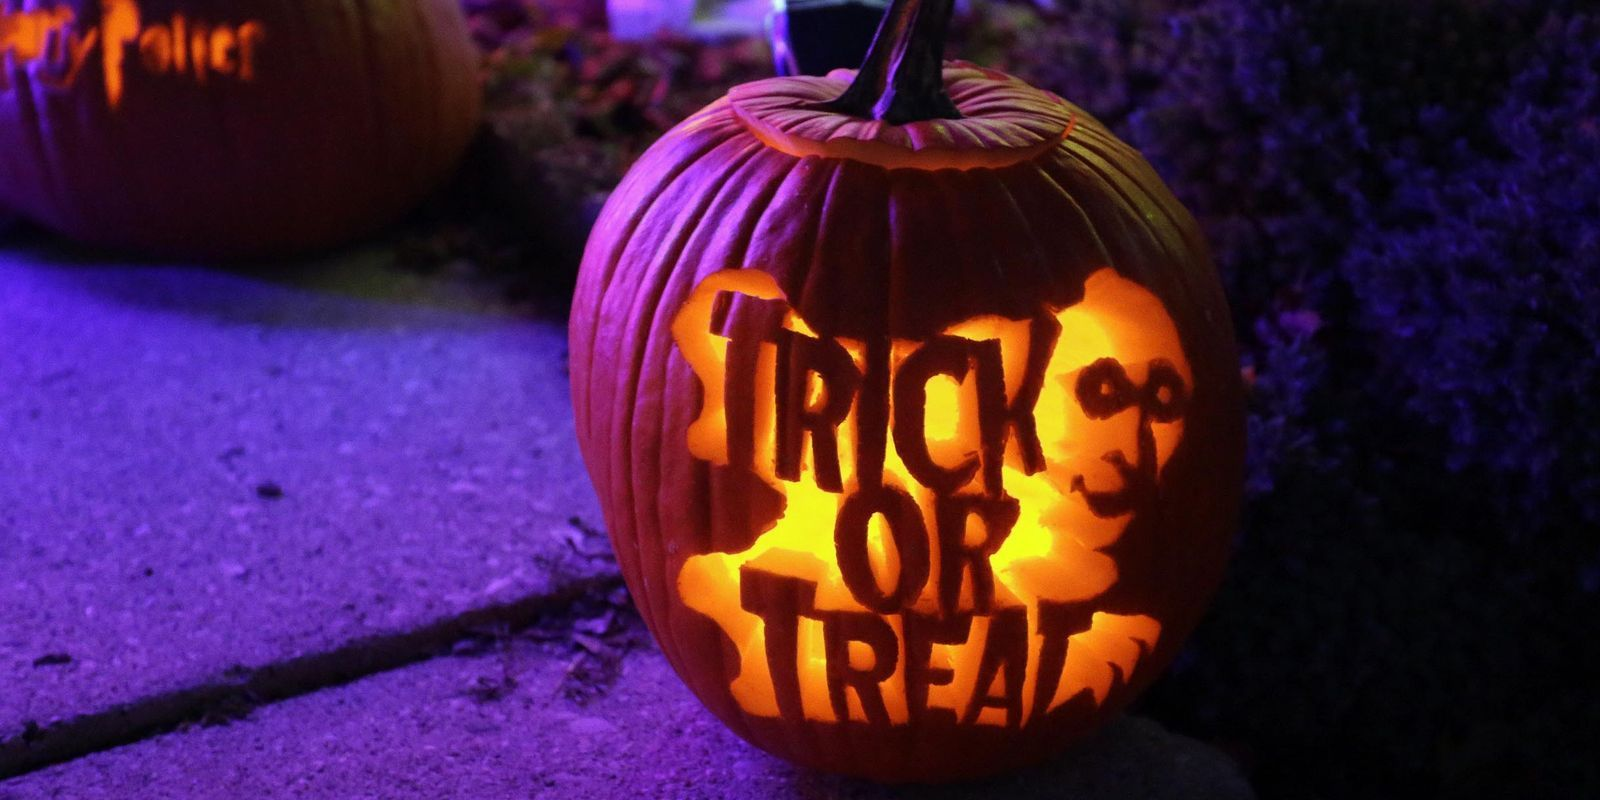 Halloween trick or treat, amber tamlyn nude